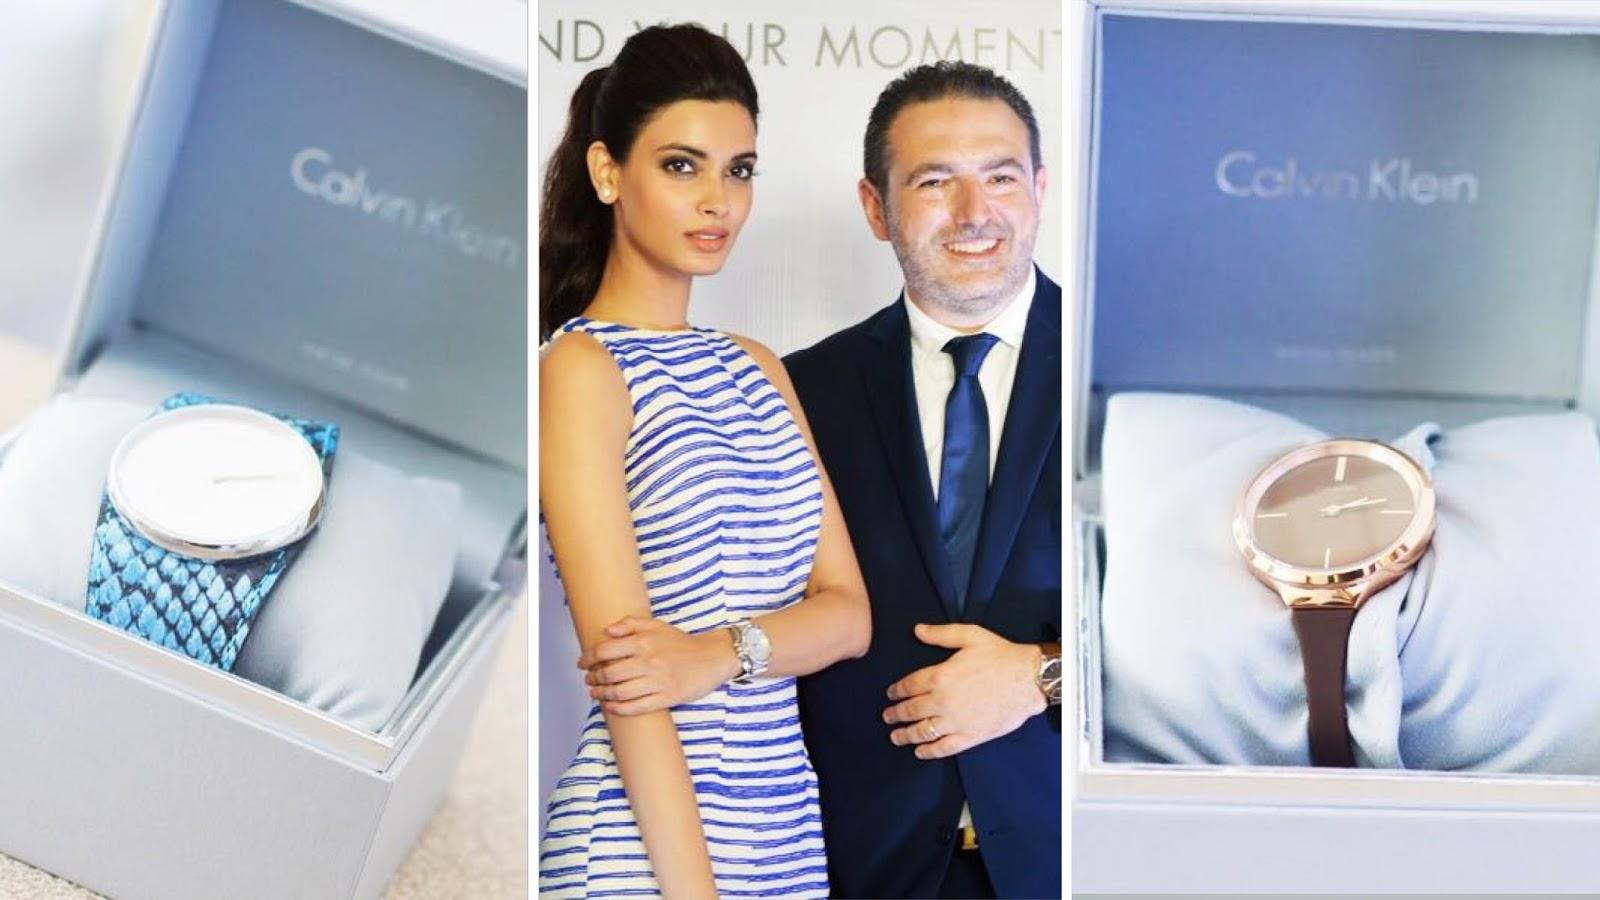 Calvin Klein Watches India